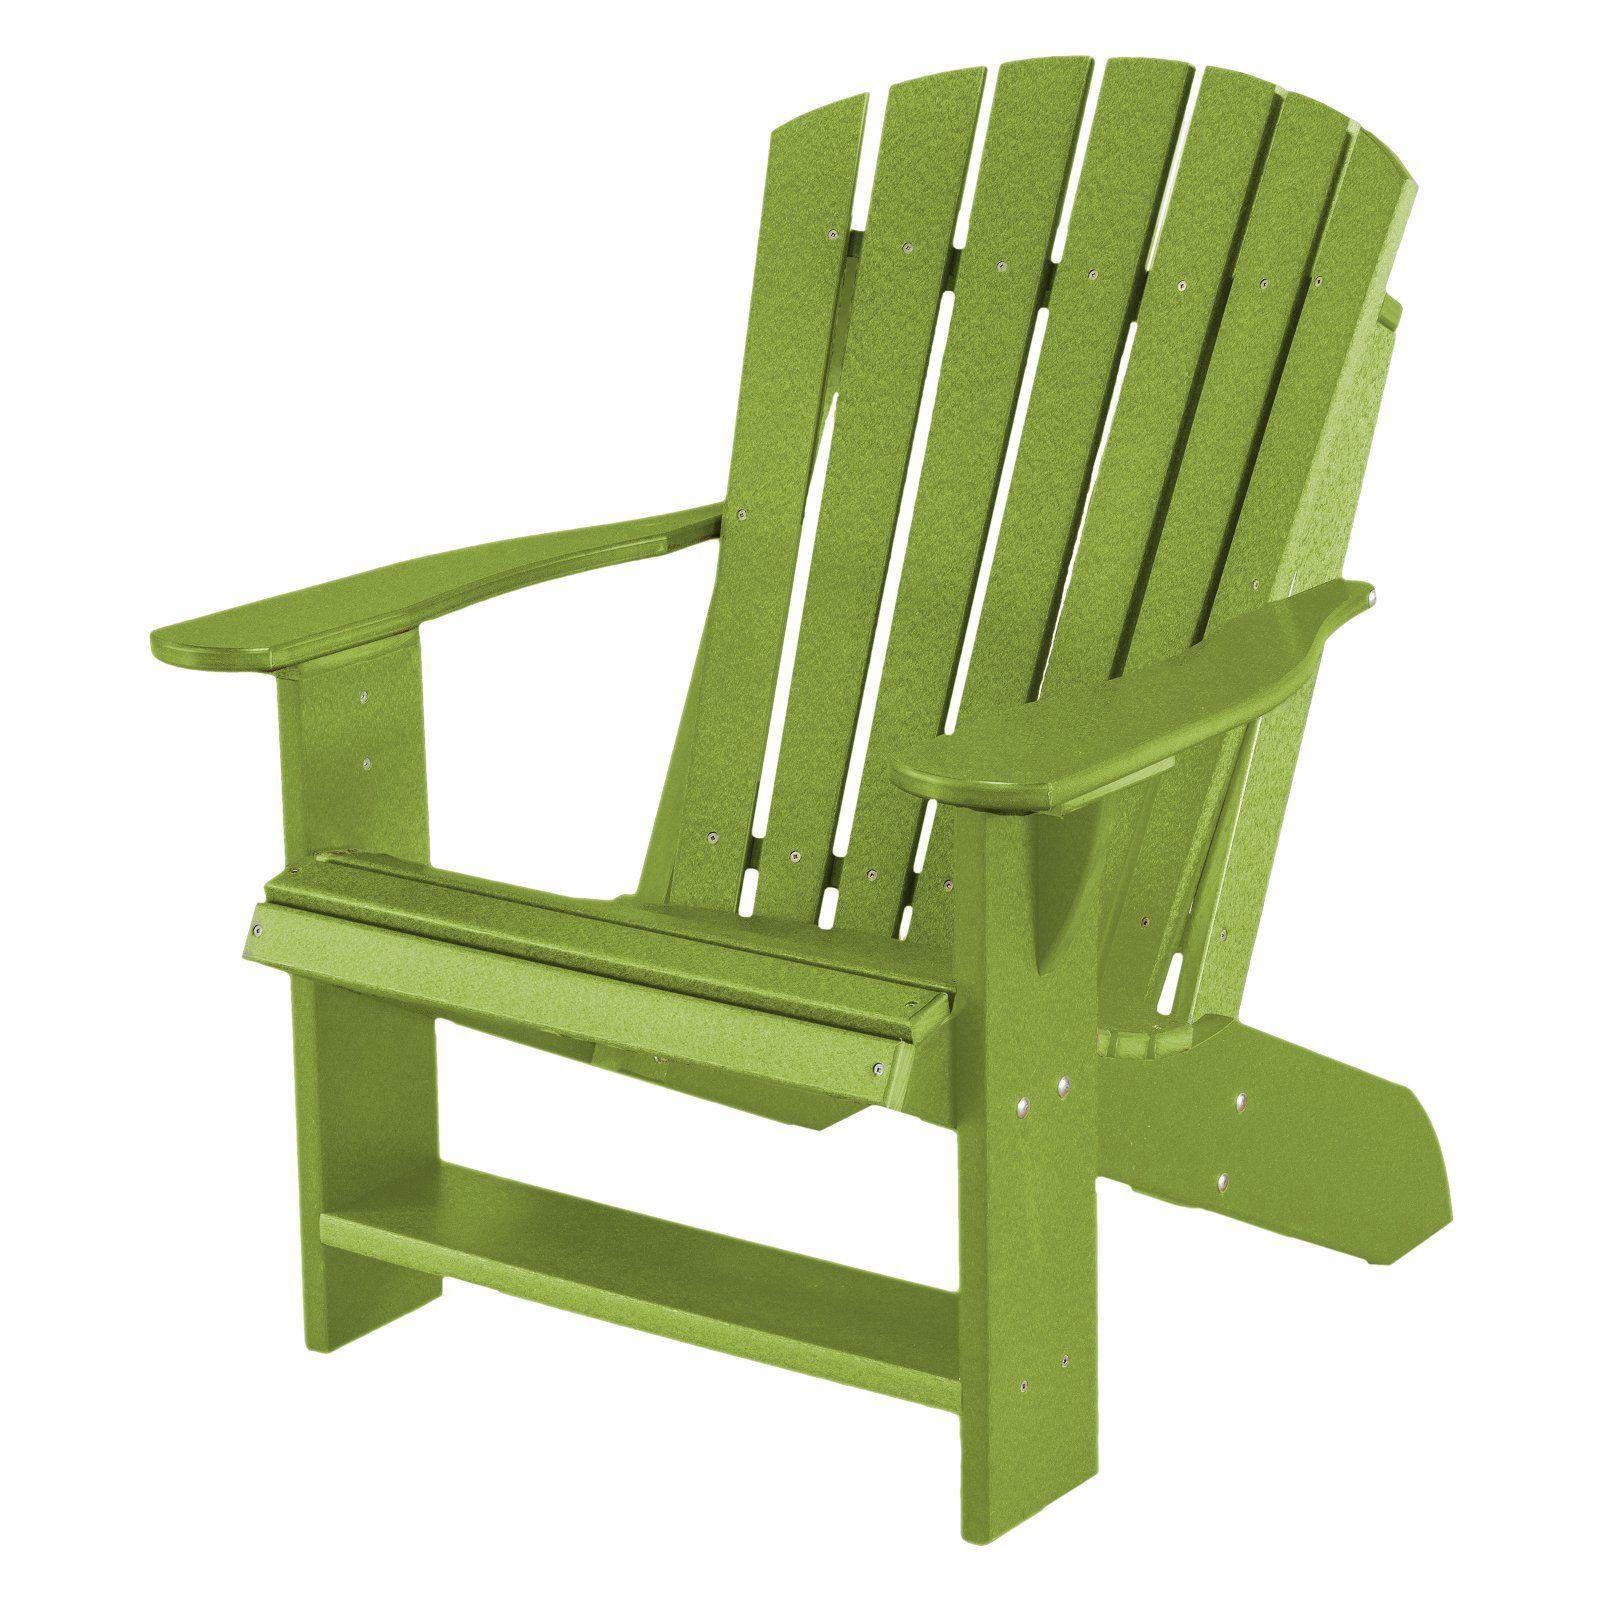 Outdoor Wildridge Heritage Adirondack Chair Recycled